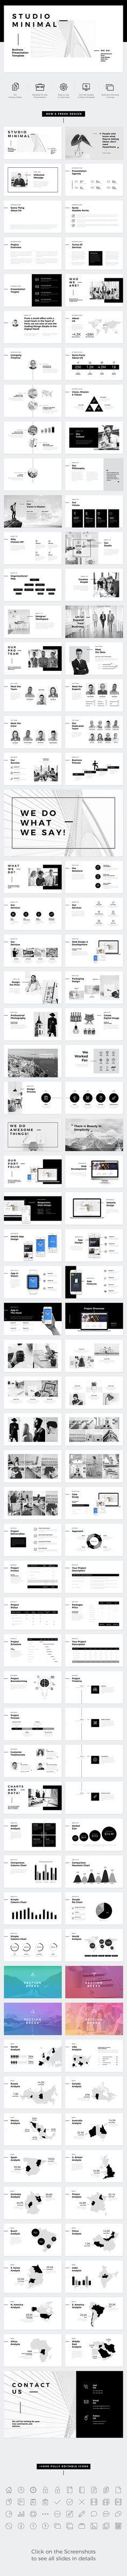 22 best minimalist powerpoint presentation templates images in 2018